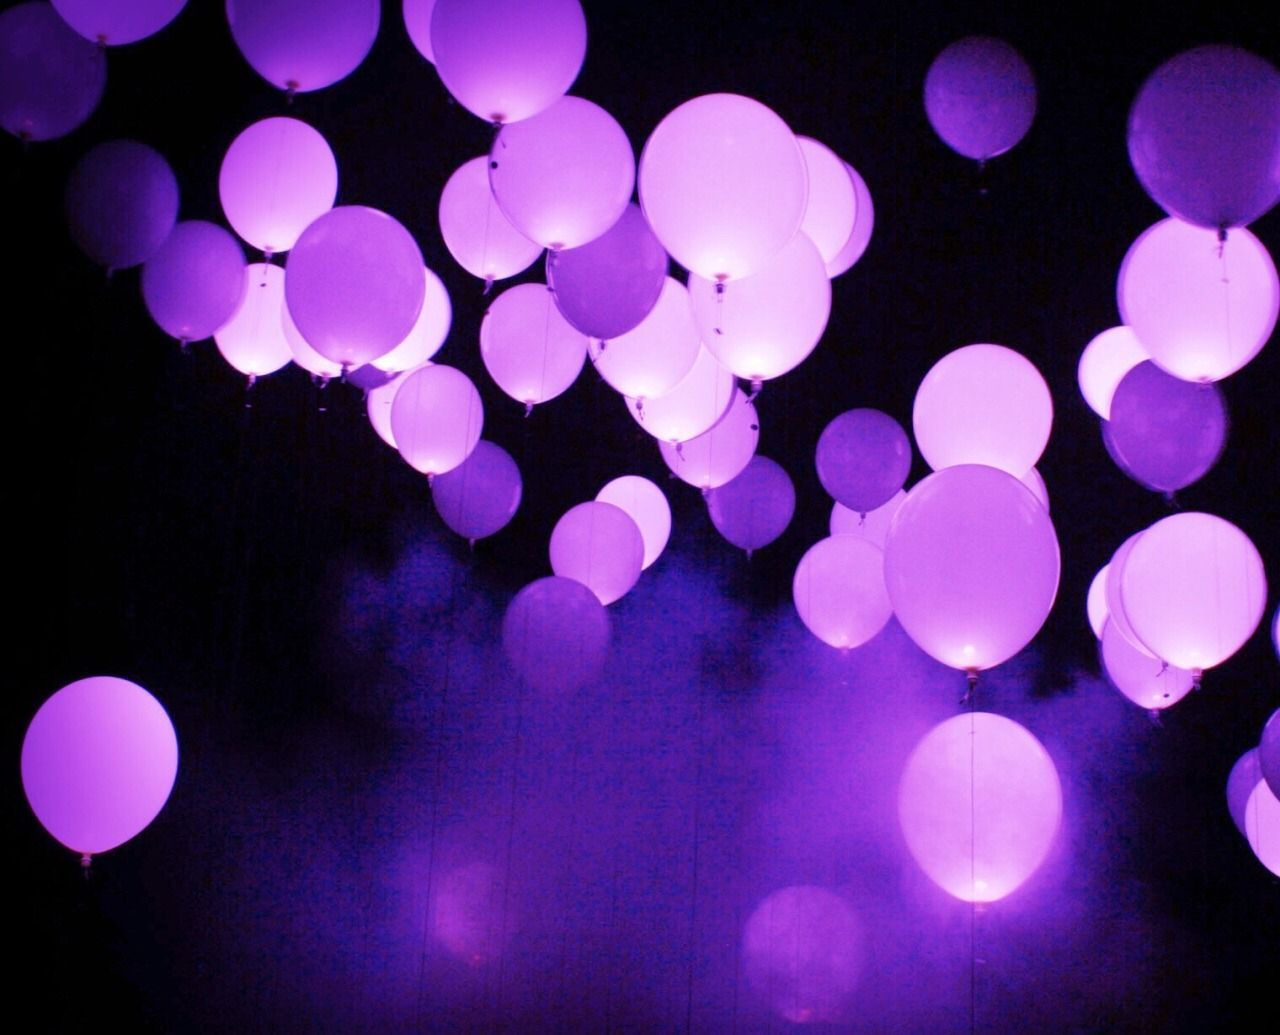 Royal Purple Aesthetic Wallpapers Top Free Royal Purple Aesthetic